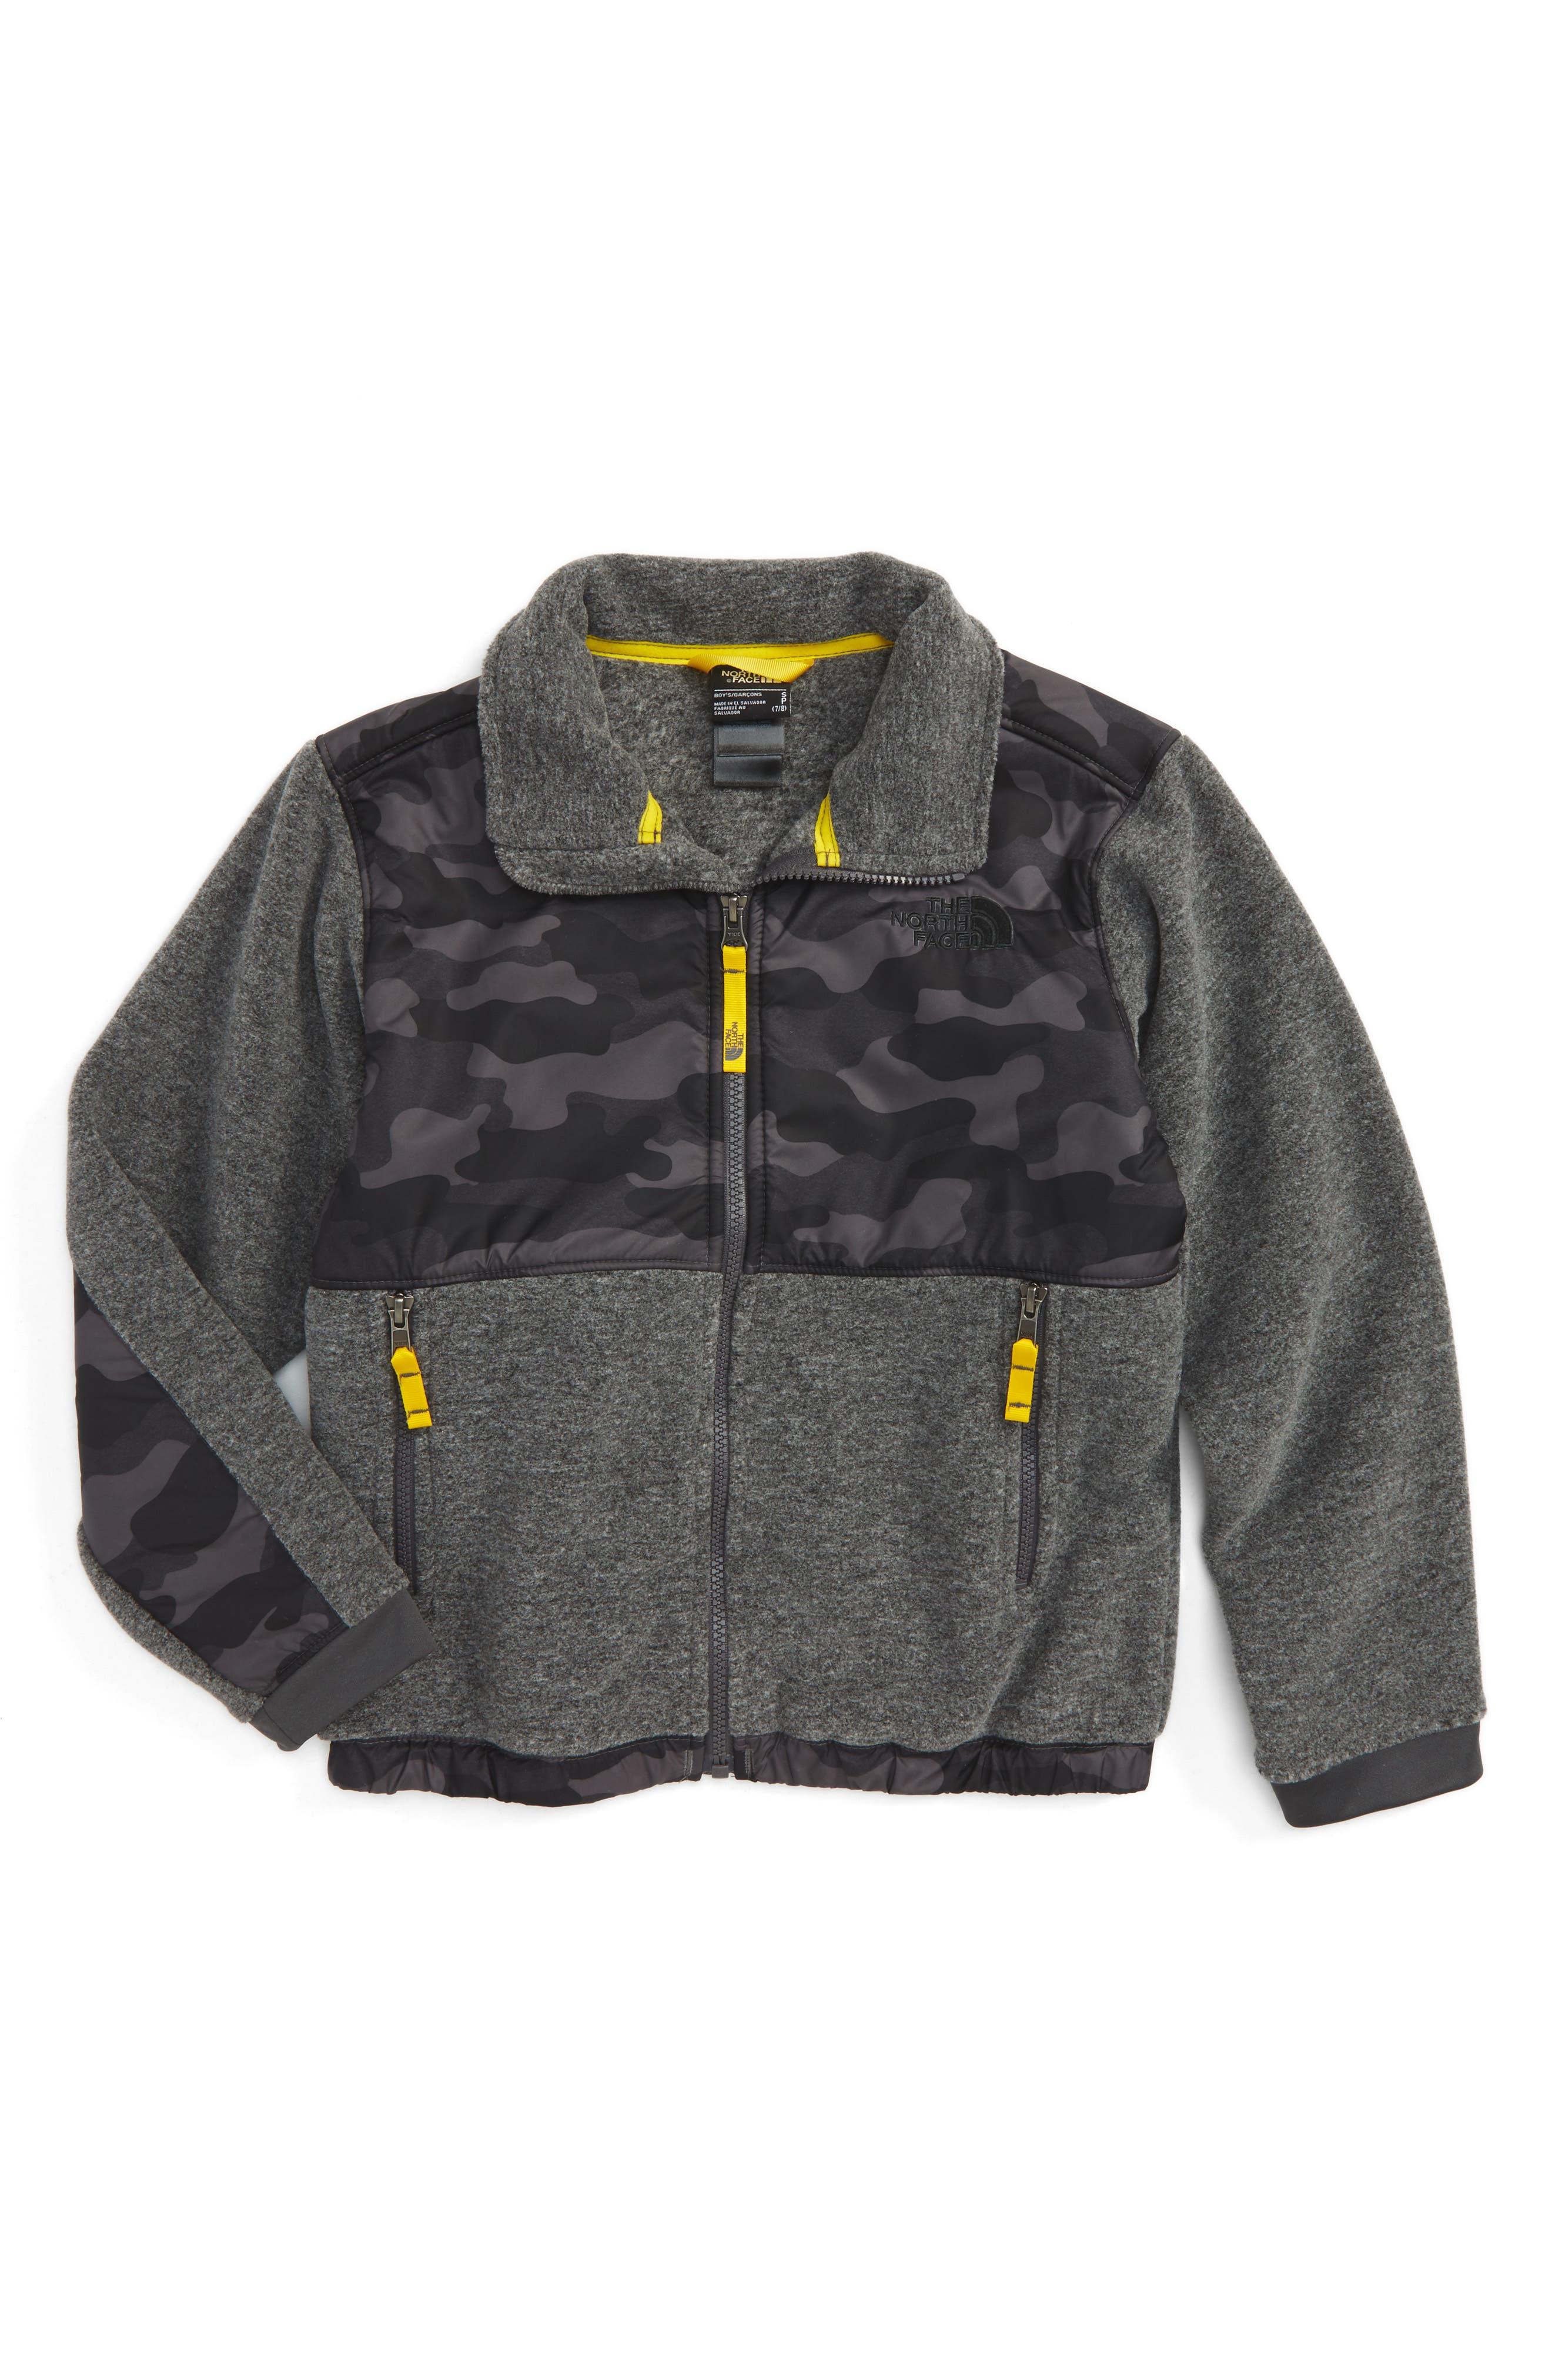 'Denali' Thermal Jacket,                         Main,                         color, Camo Heather Print